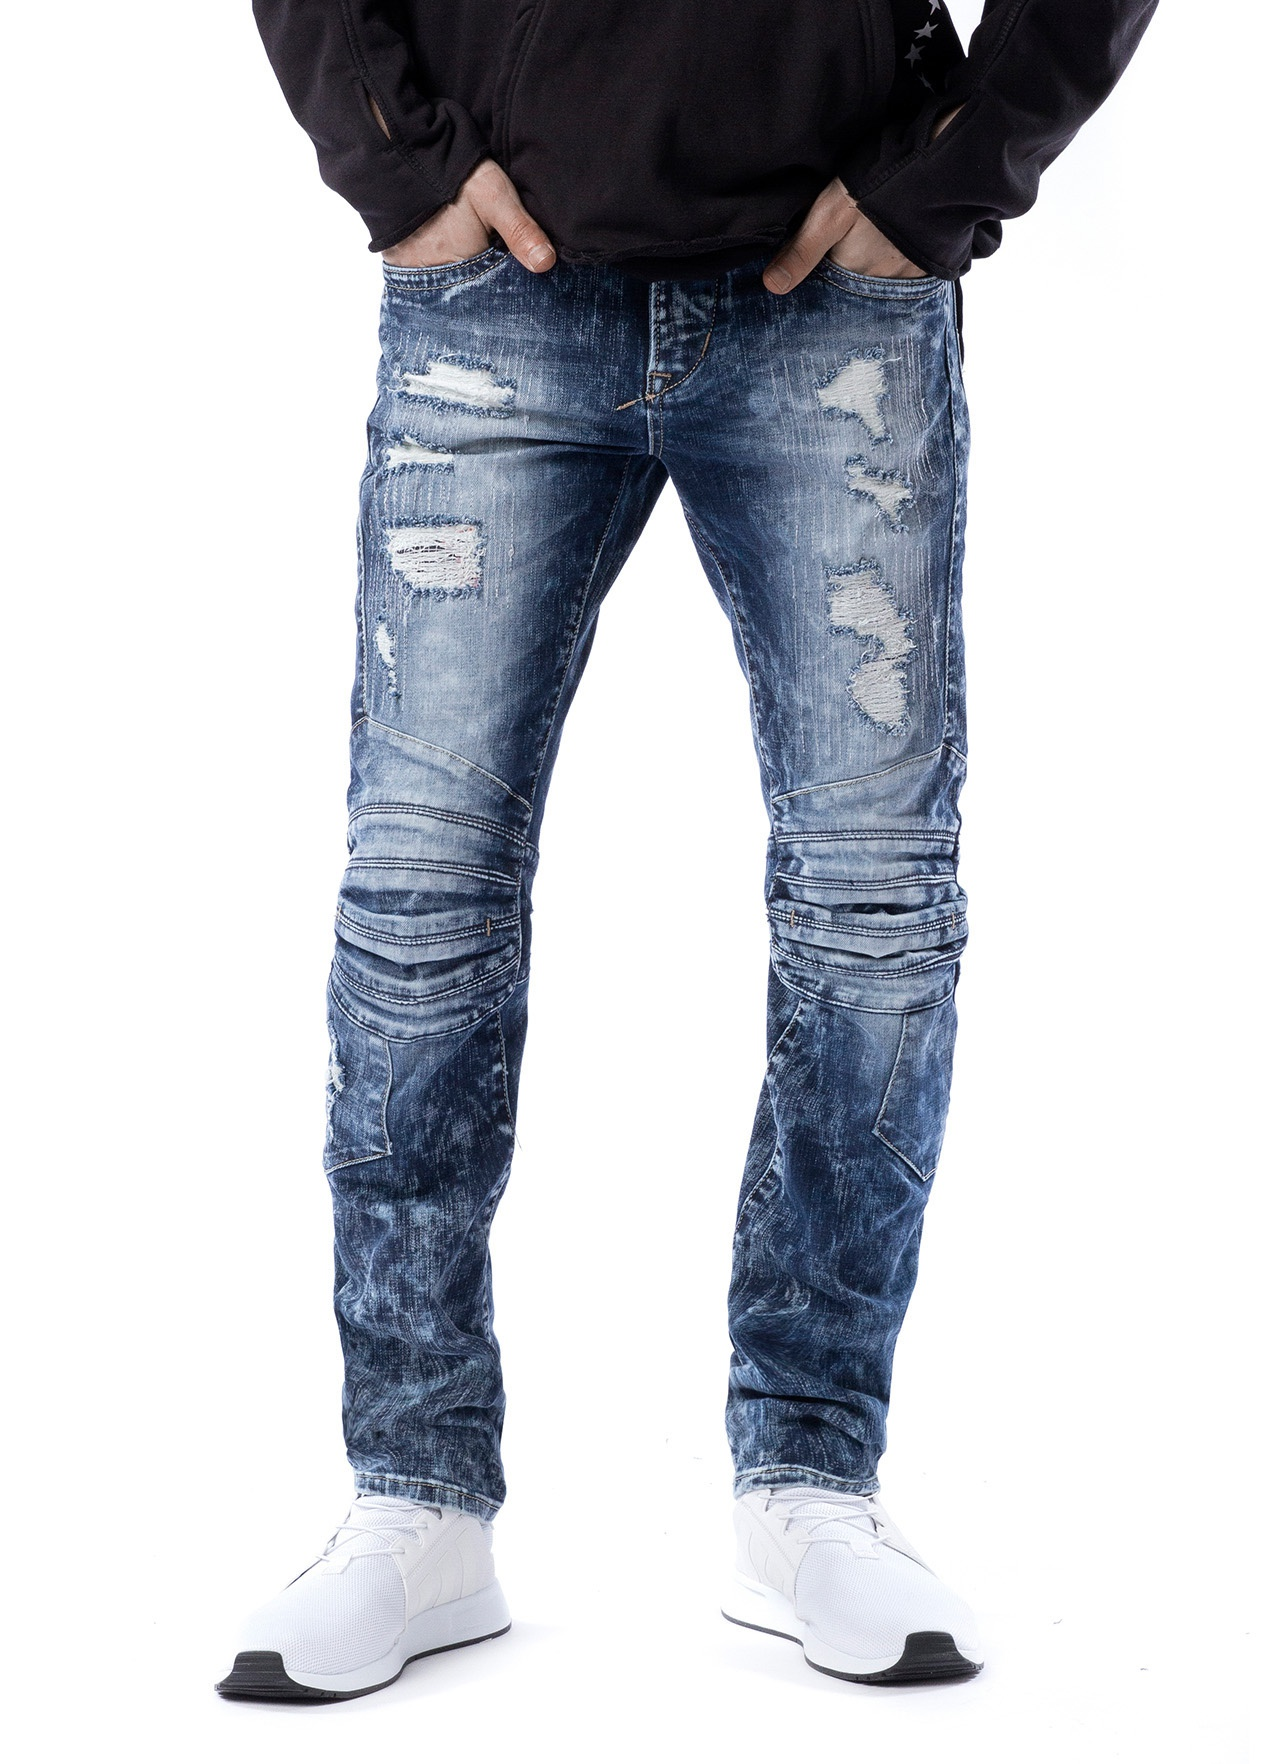 Men's Clothing Online | Designer Wear for Men | Parasuco